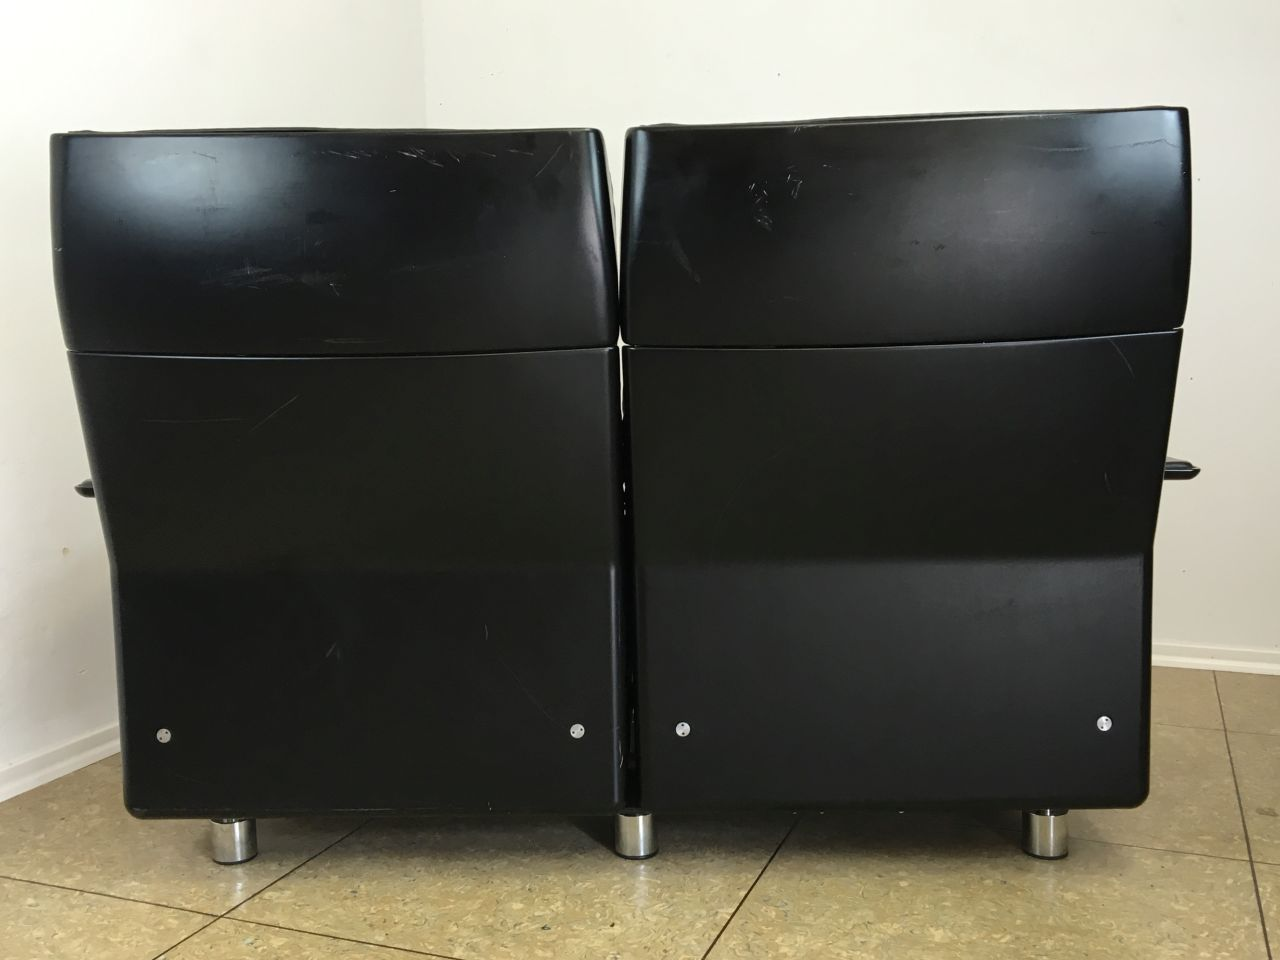 modulares vintage 620 sofa system von dieter rams f r vitsoe bei pamono kaufen. Black Bedroom Furniture Sets. Home Design Ideas